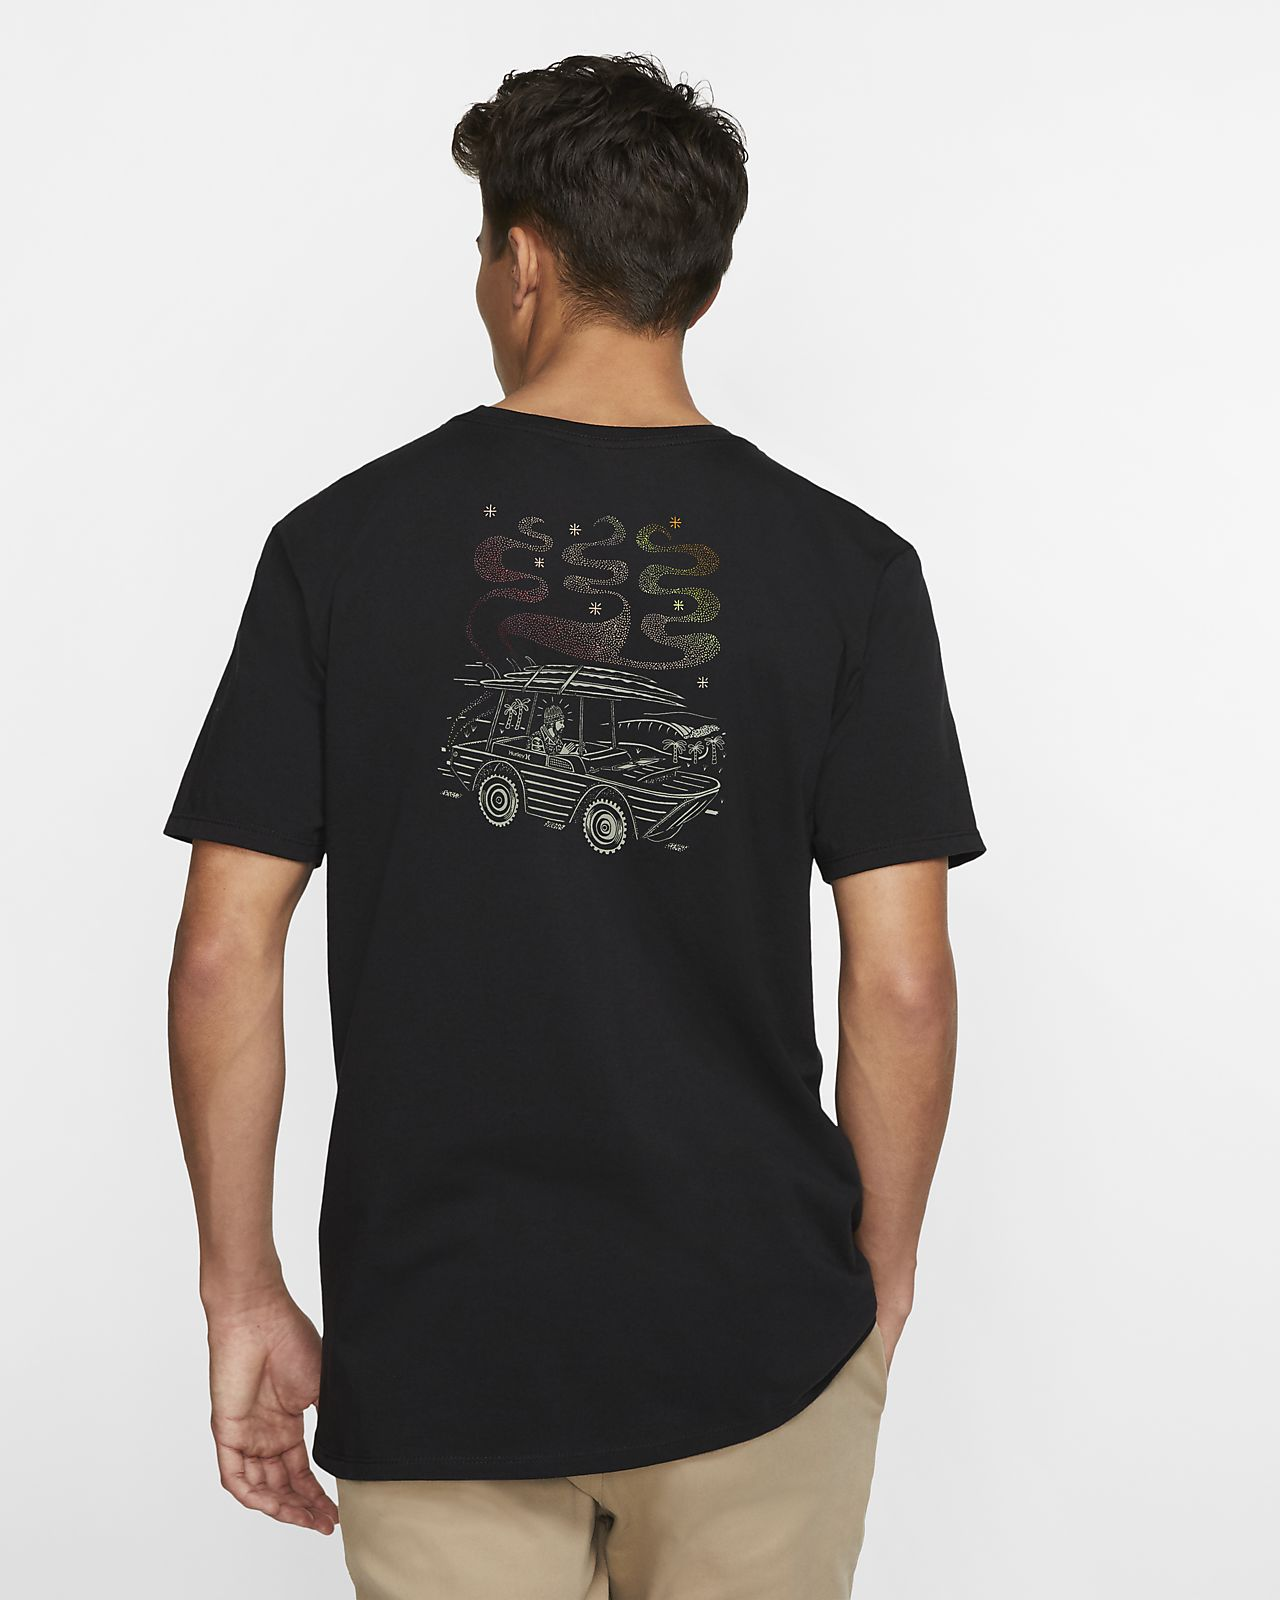 T-shirt Hurley Premium Search And Destroy Premium Fit för män